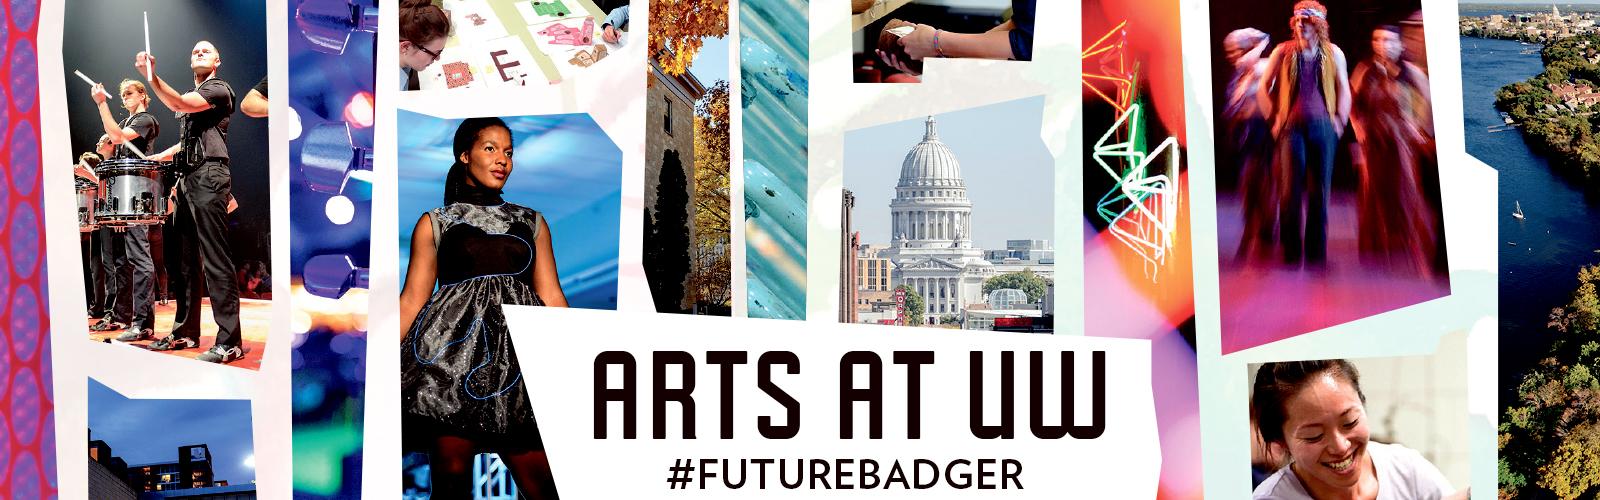 Arts at UW #futurebadger